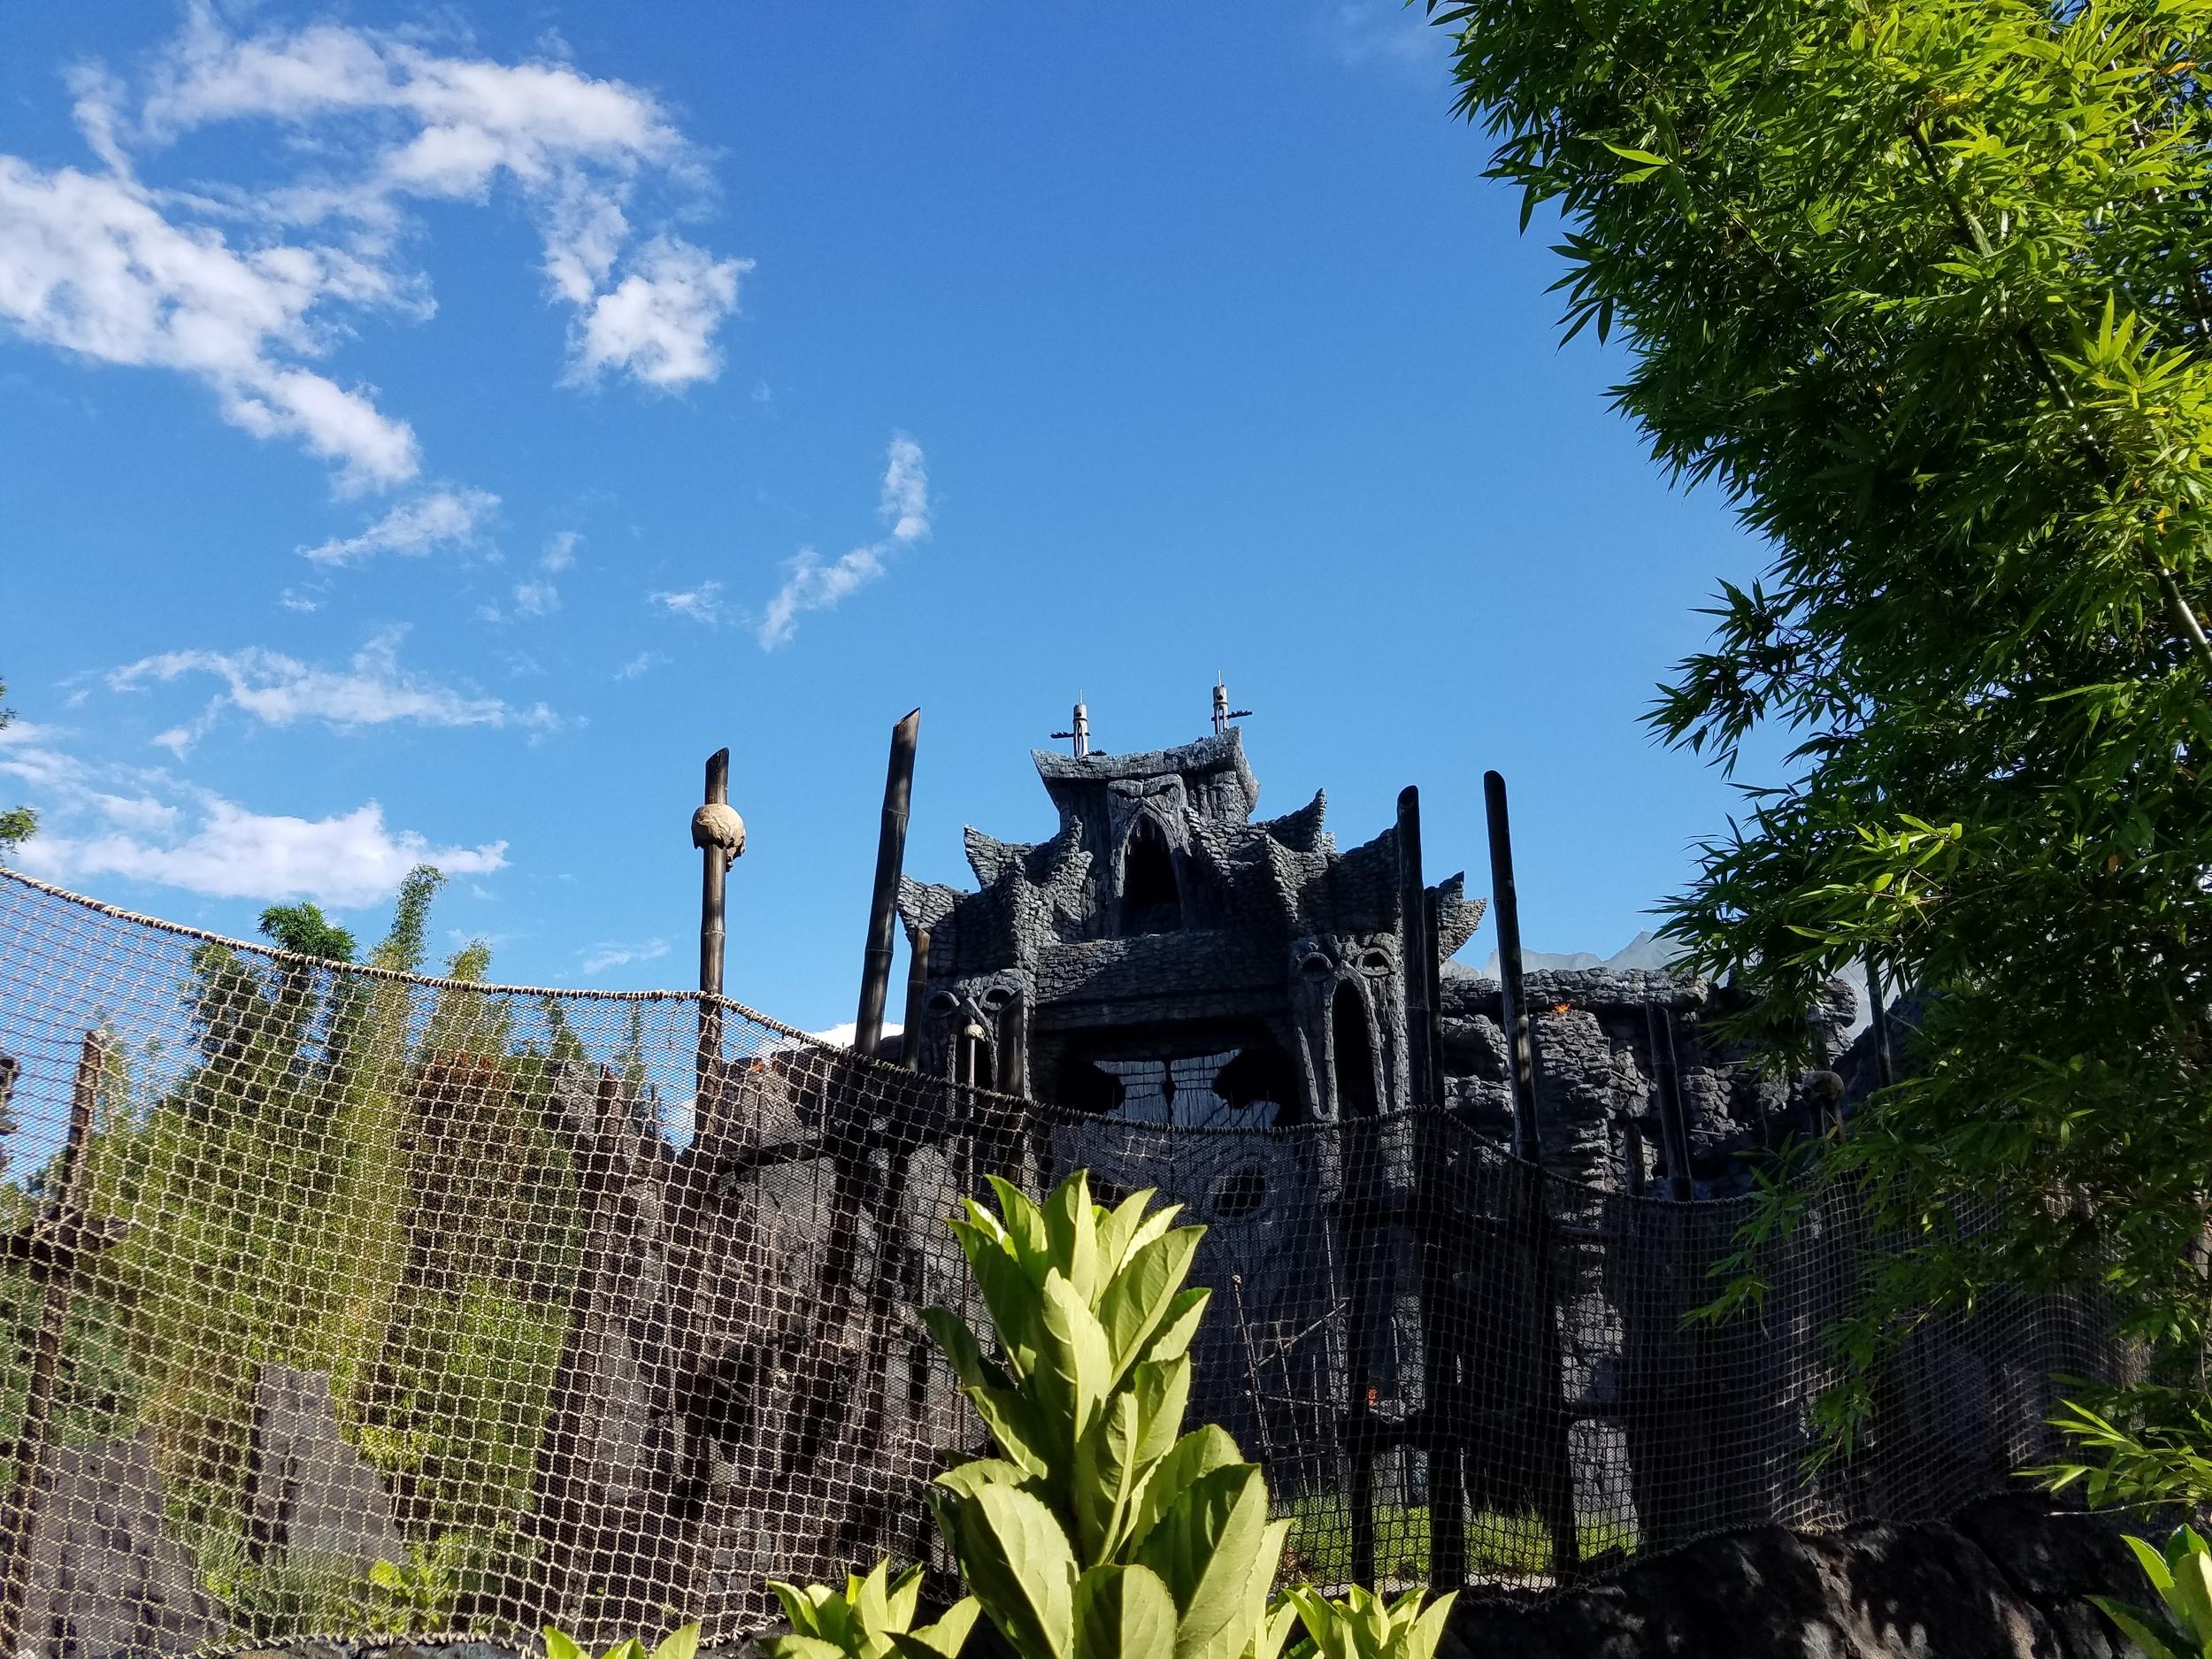 Skull Island: Reign of Kong Ride Gates